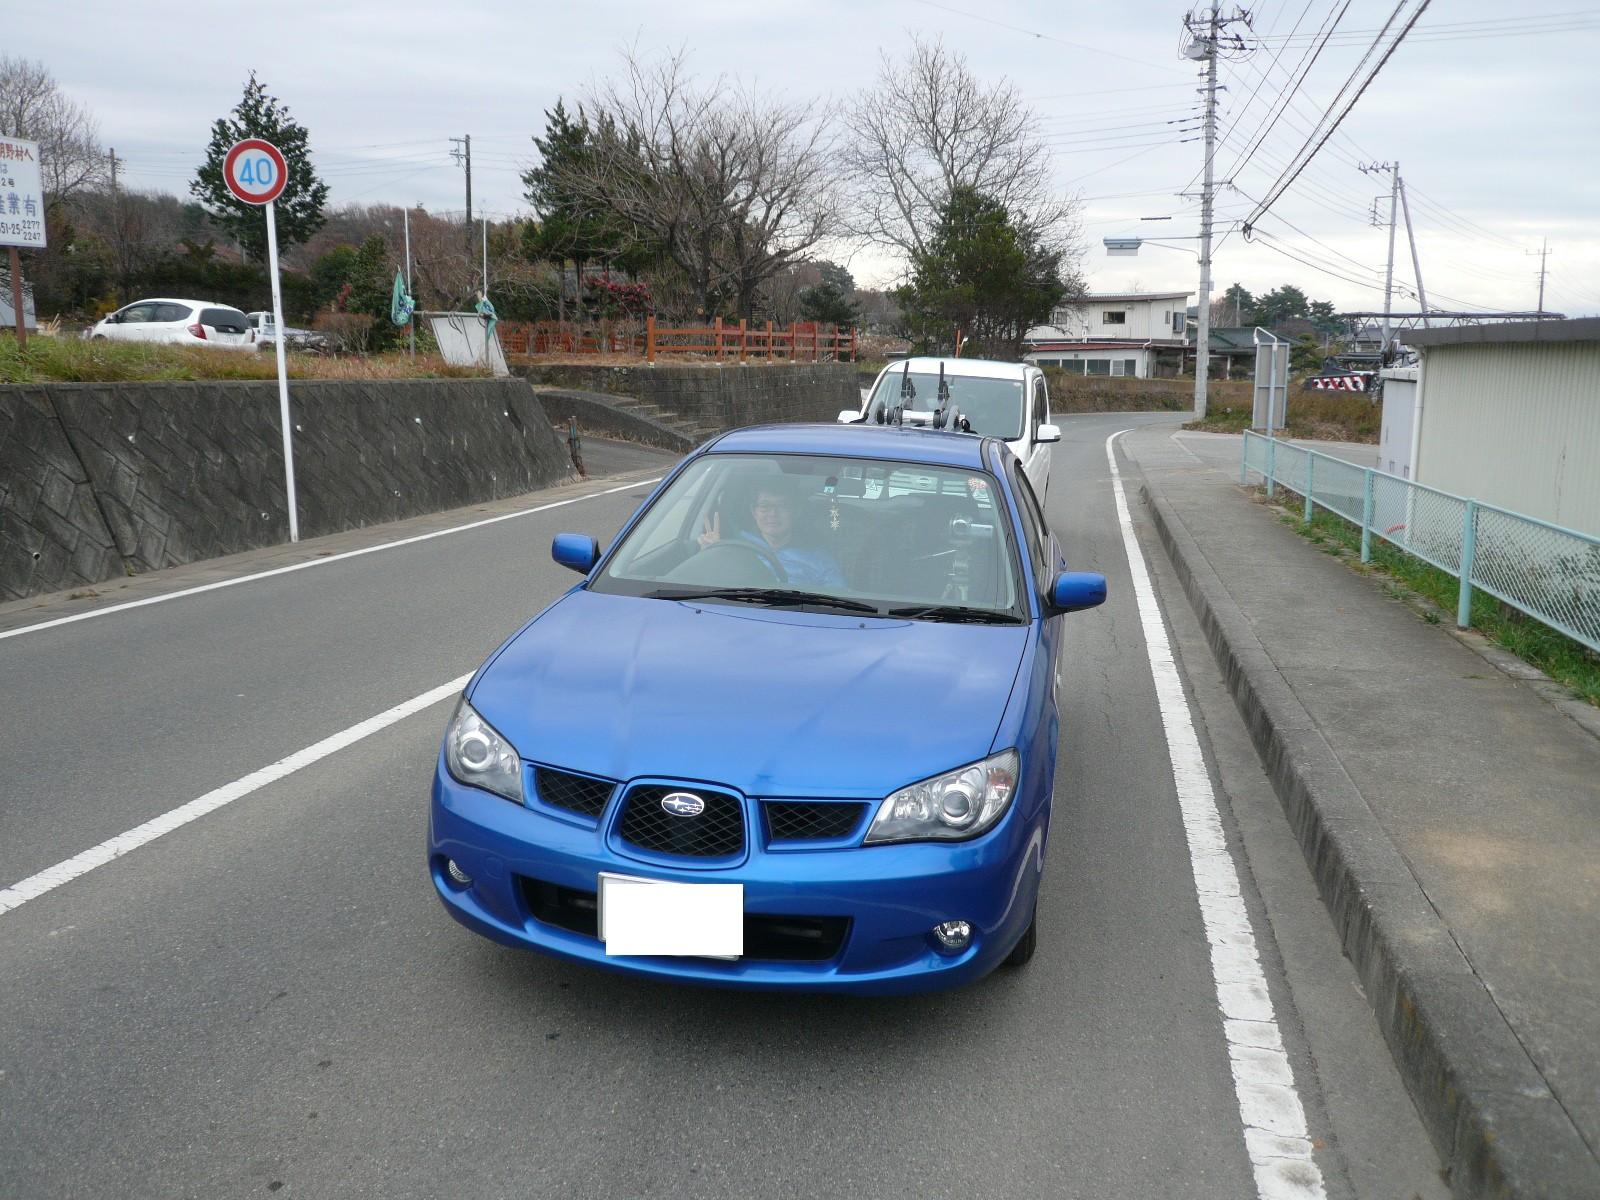 200912052